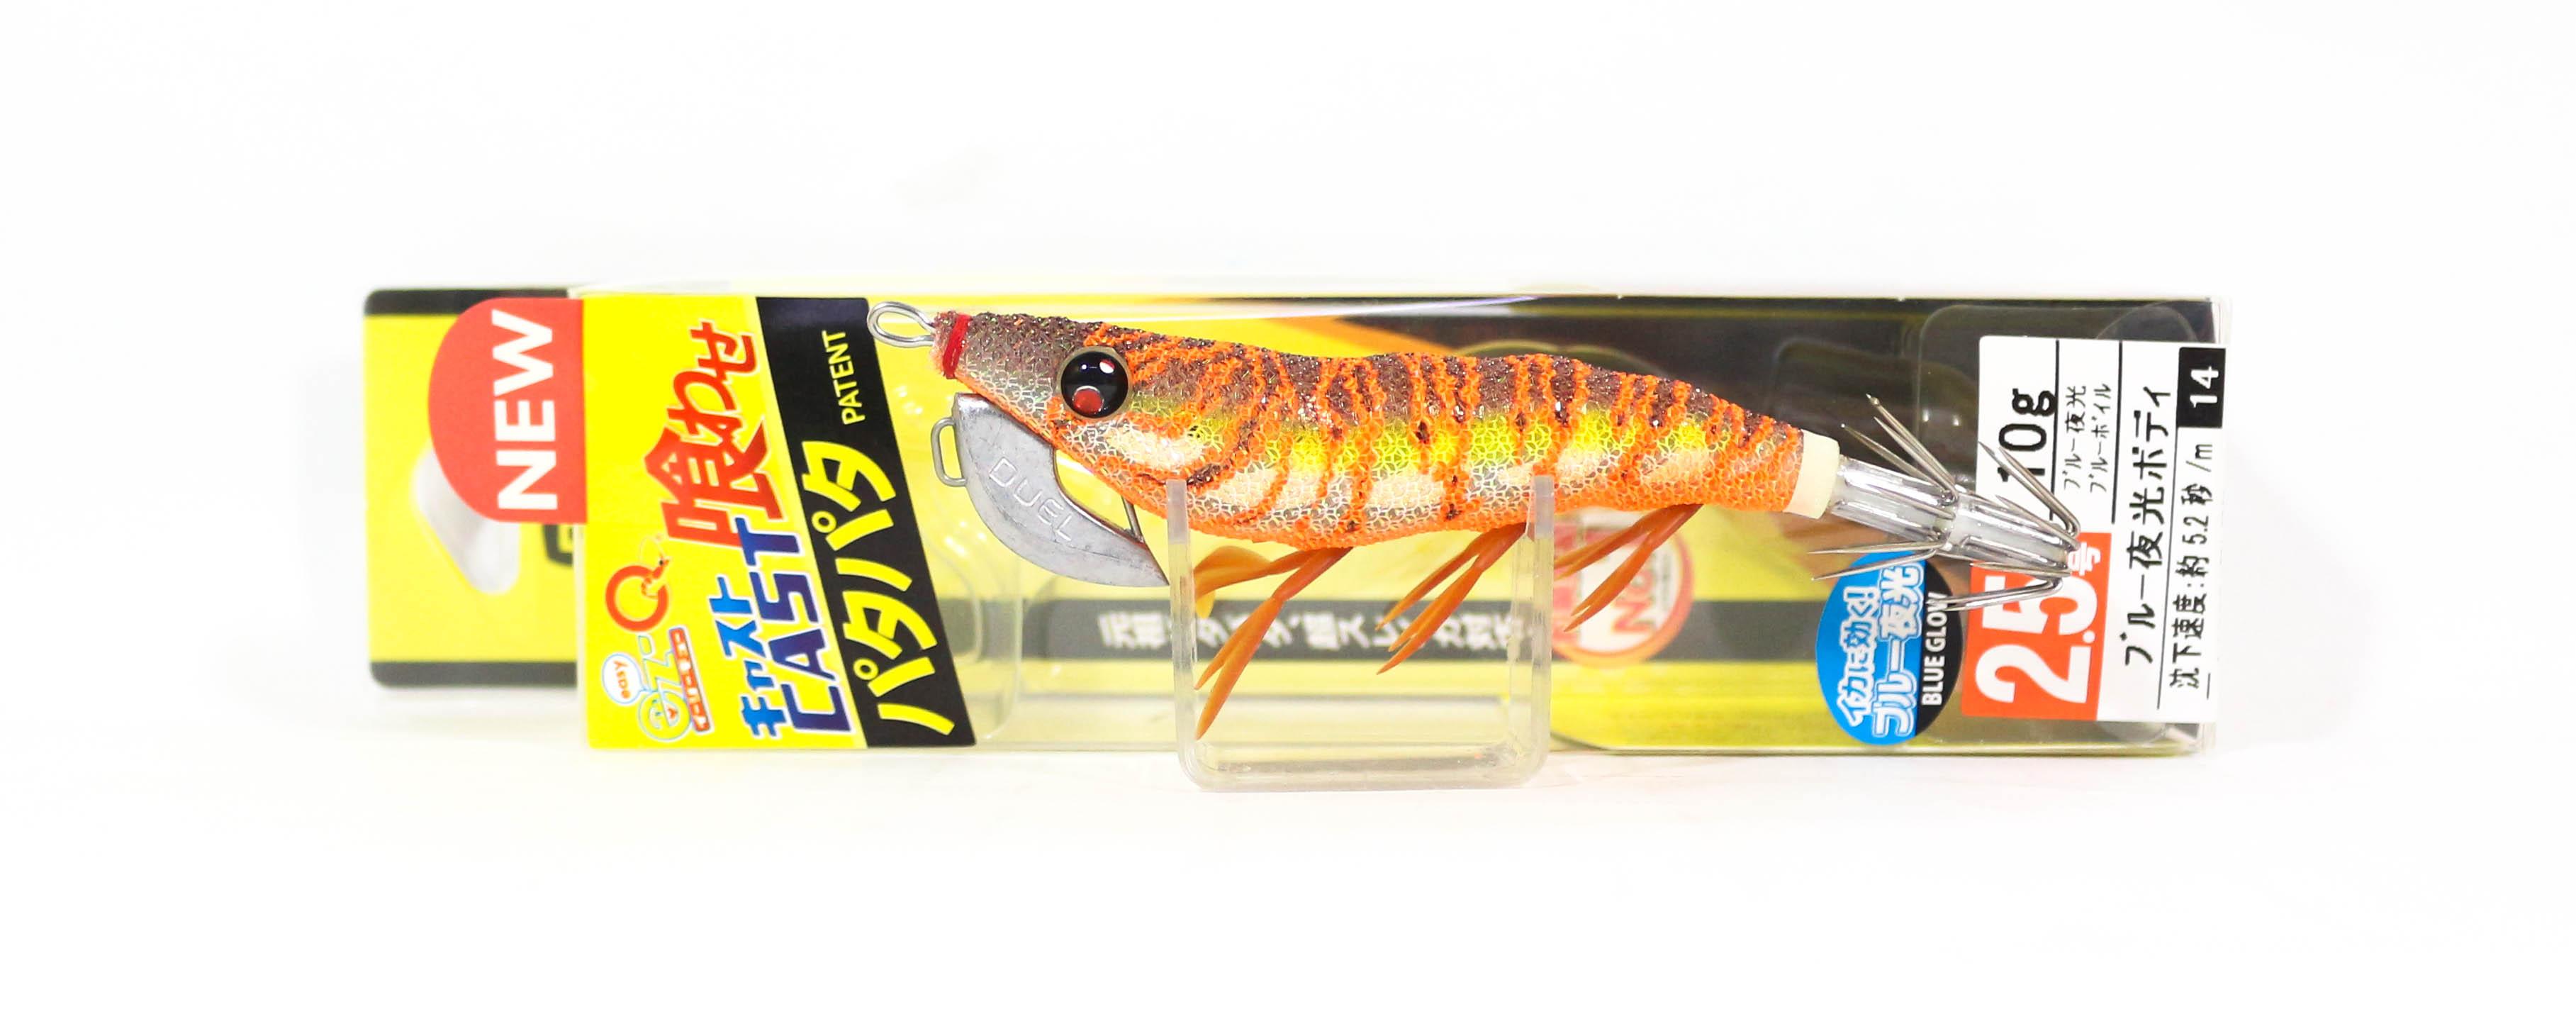 Yo Zuri Duel Egi EZ-Q Cast Squid Jig Sinking Lure 2.5 A1755-BLBW (7299)